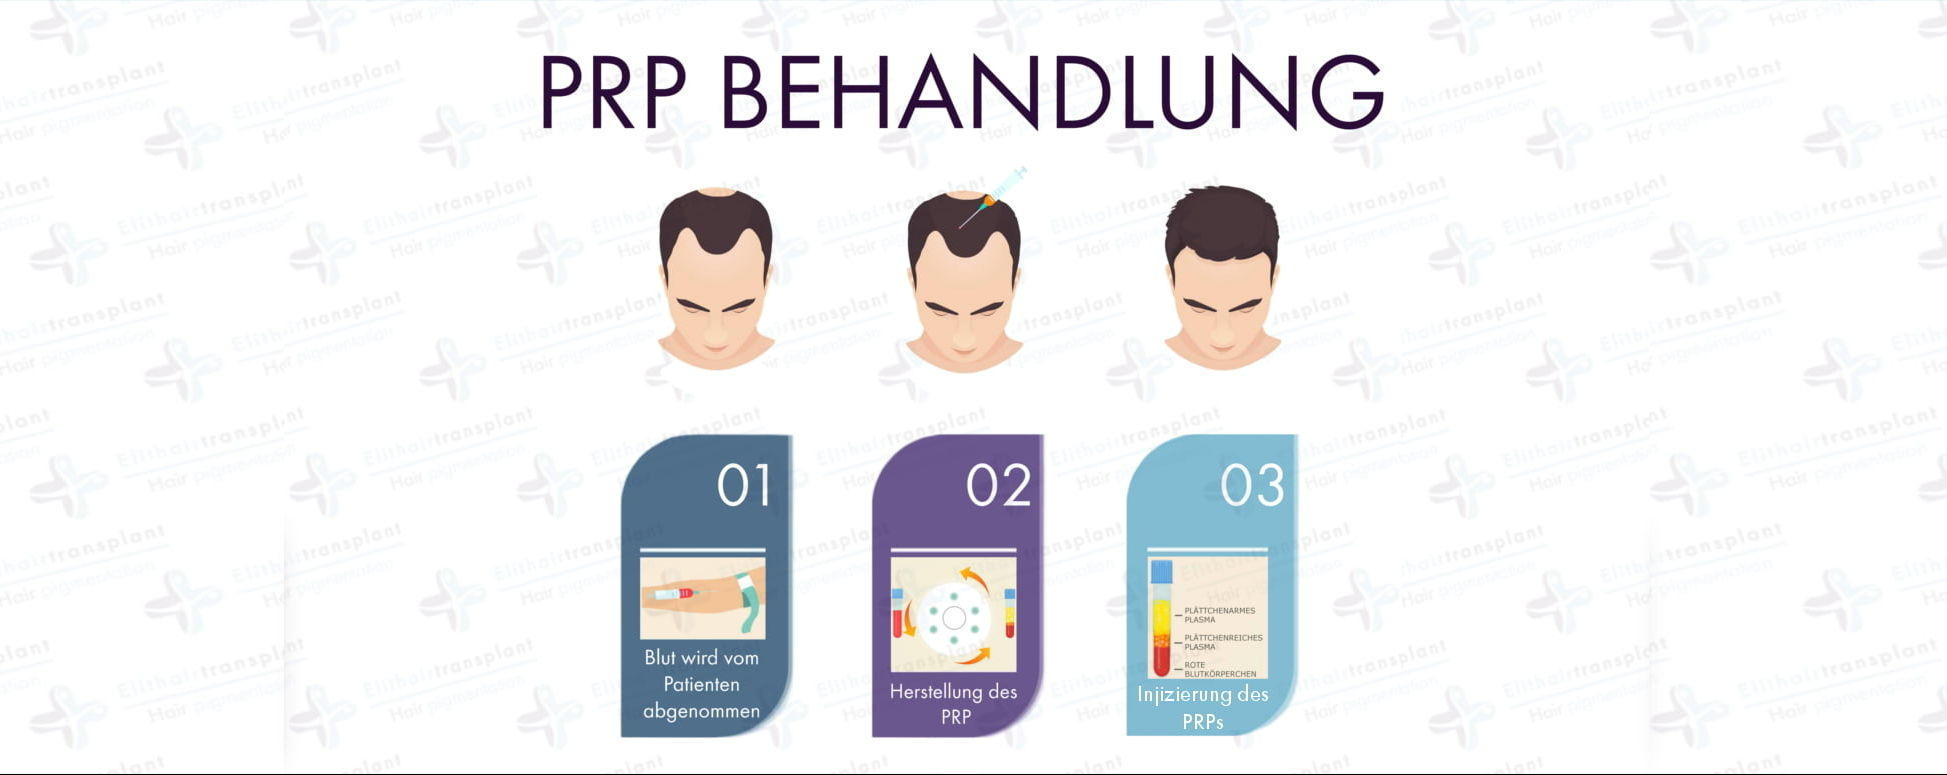 Alternativen der Haartransplantation PRP Behandlung